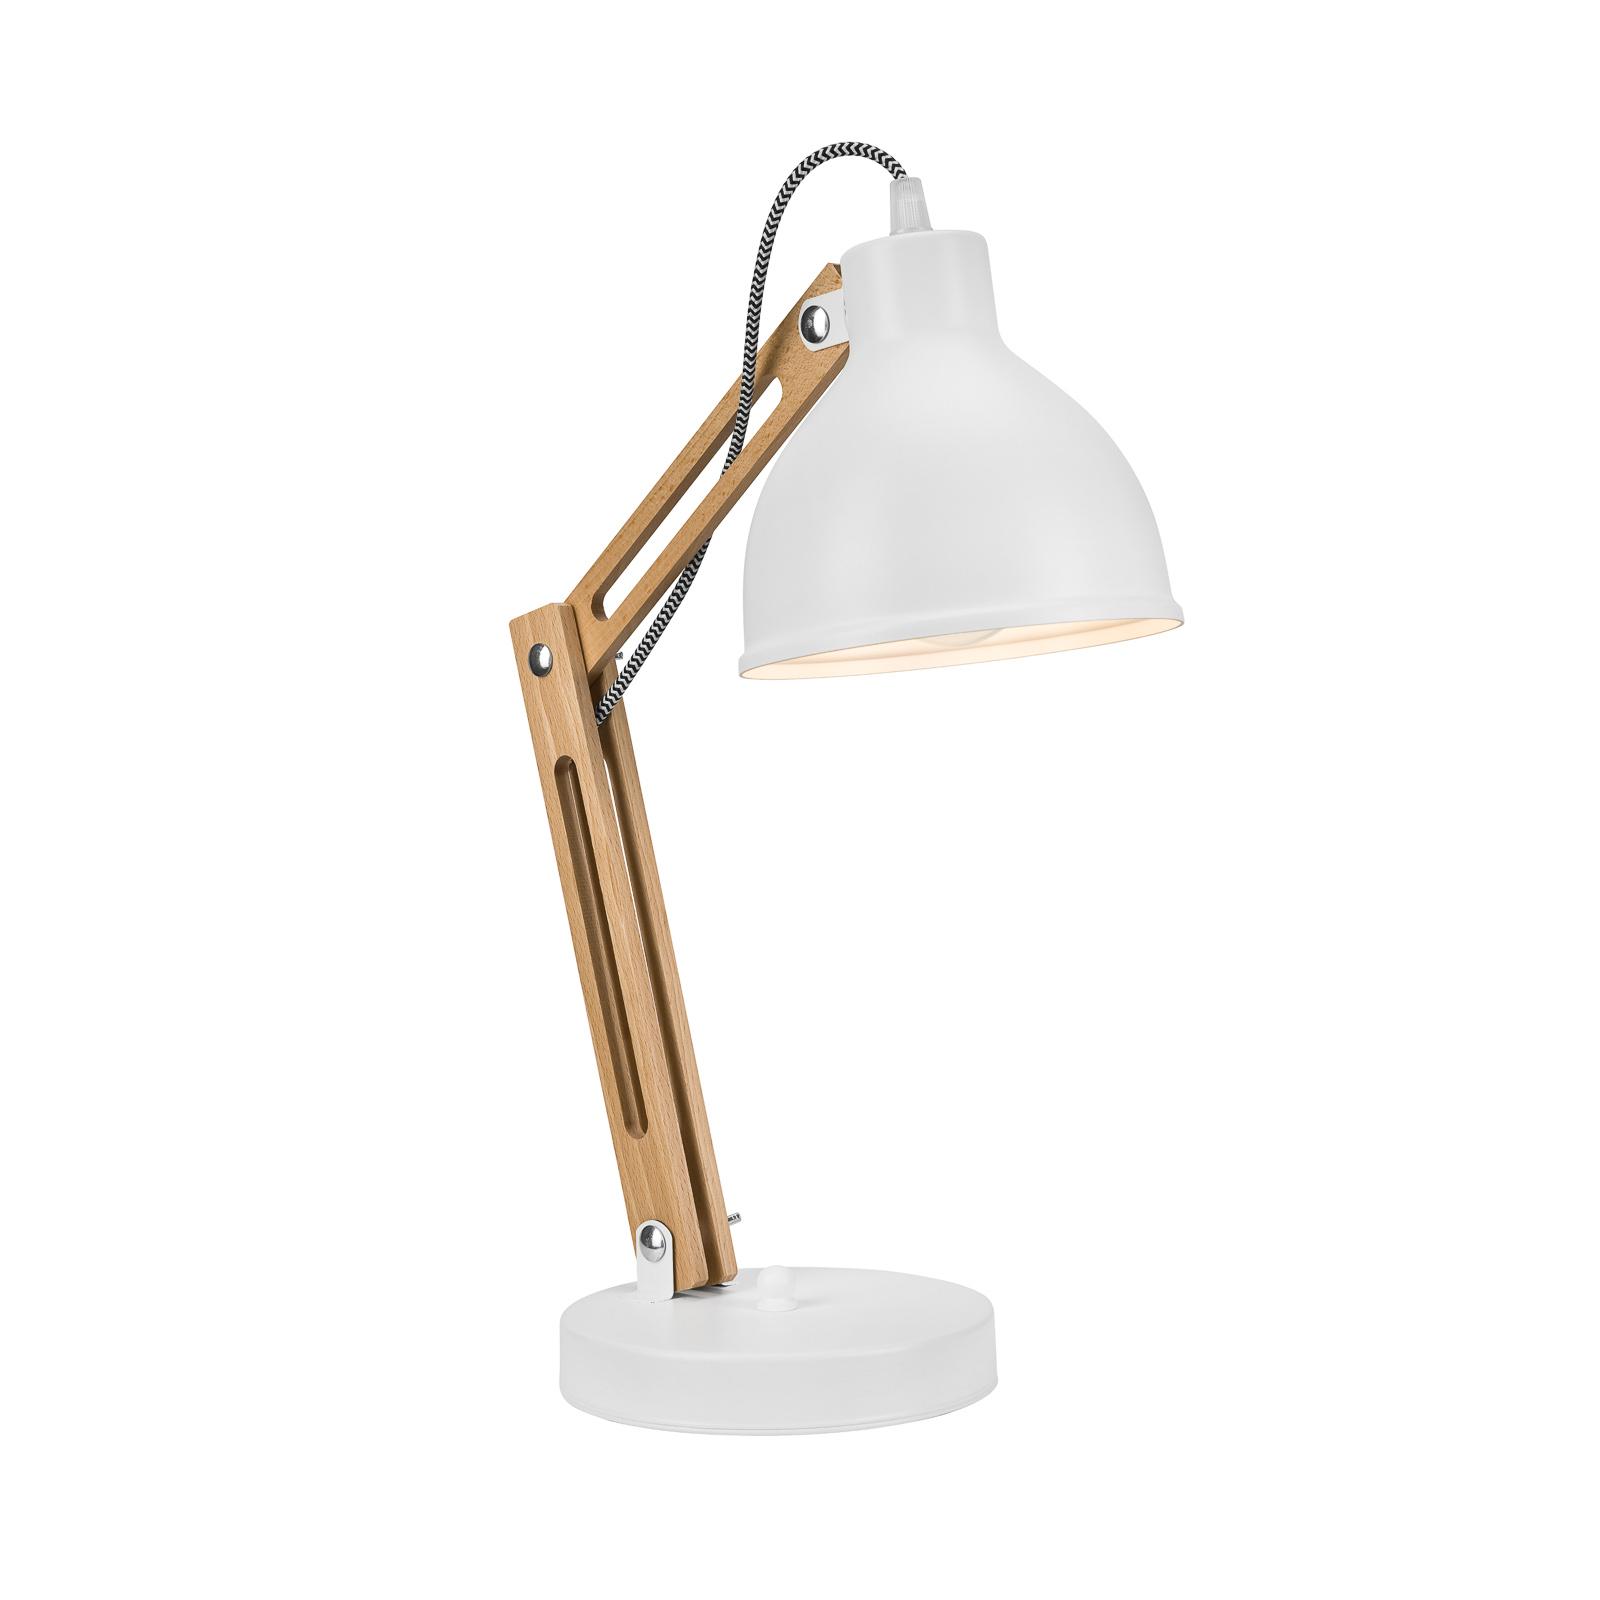 Bordlampe Skansen, justerbar, hvit